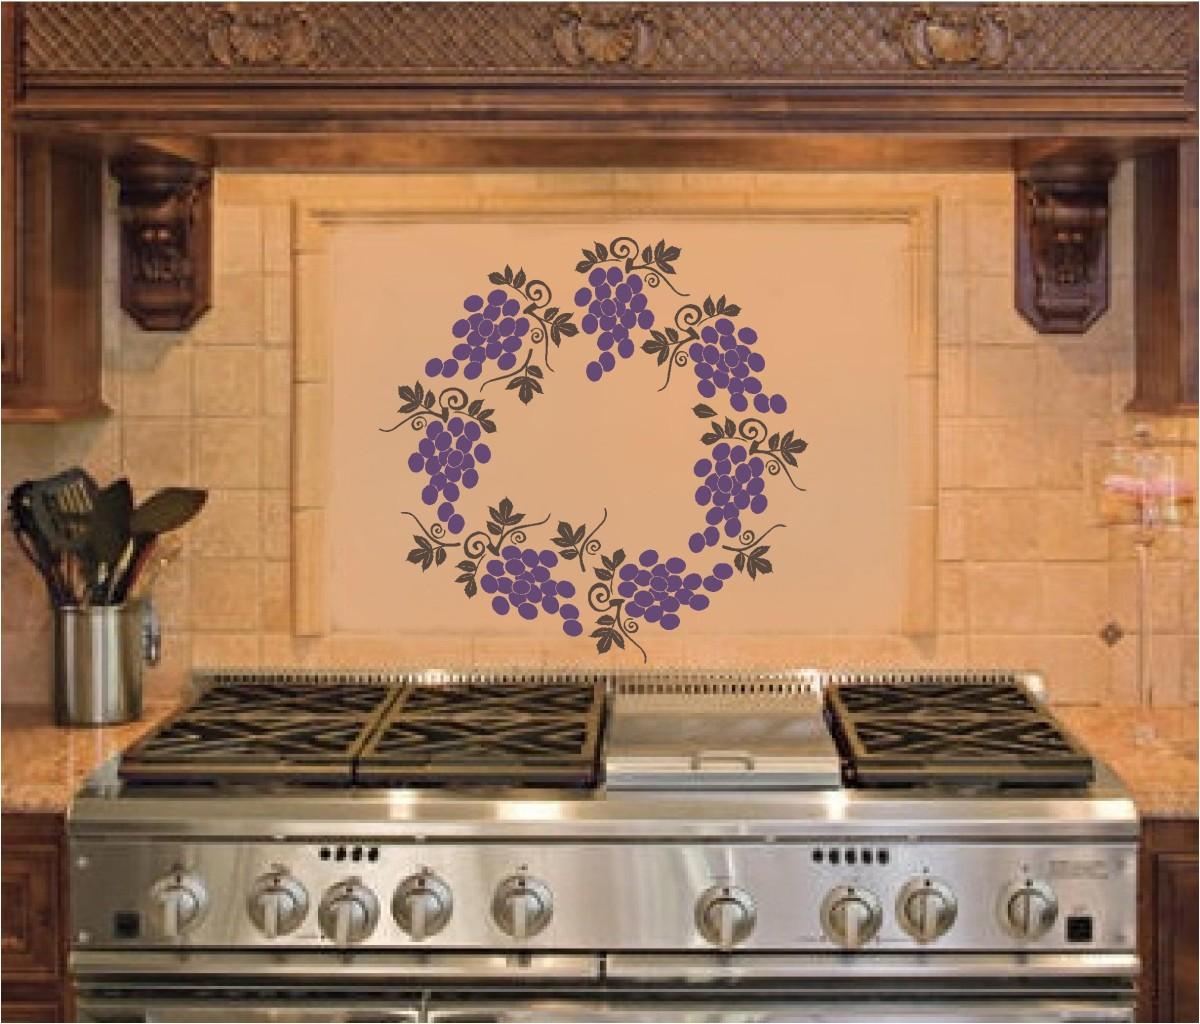 Grape Decor: Grape Wreath Kitchen Wall Stickers Vinyl Decal Decor